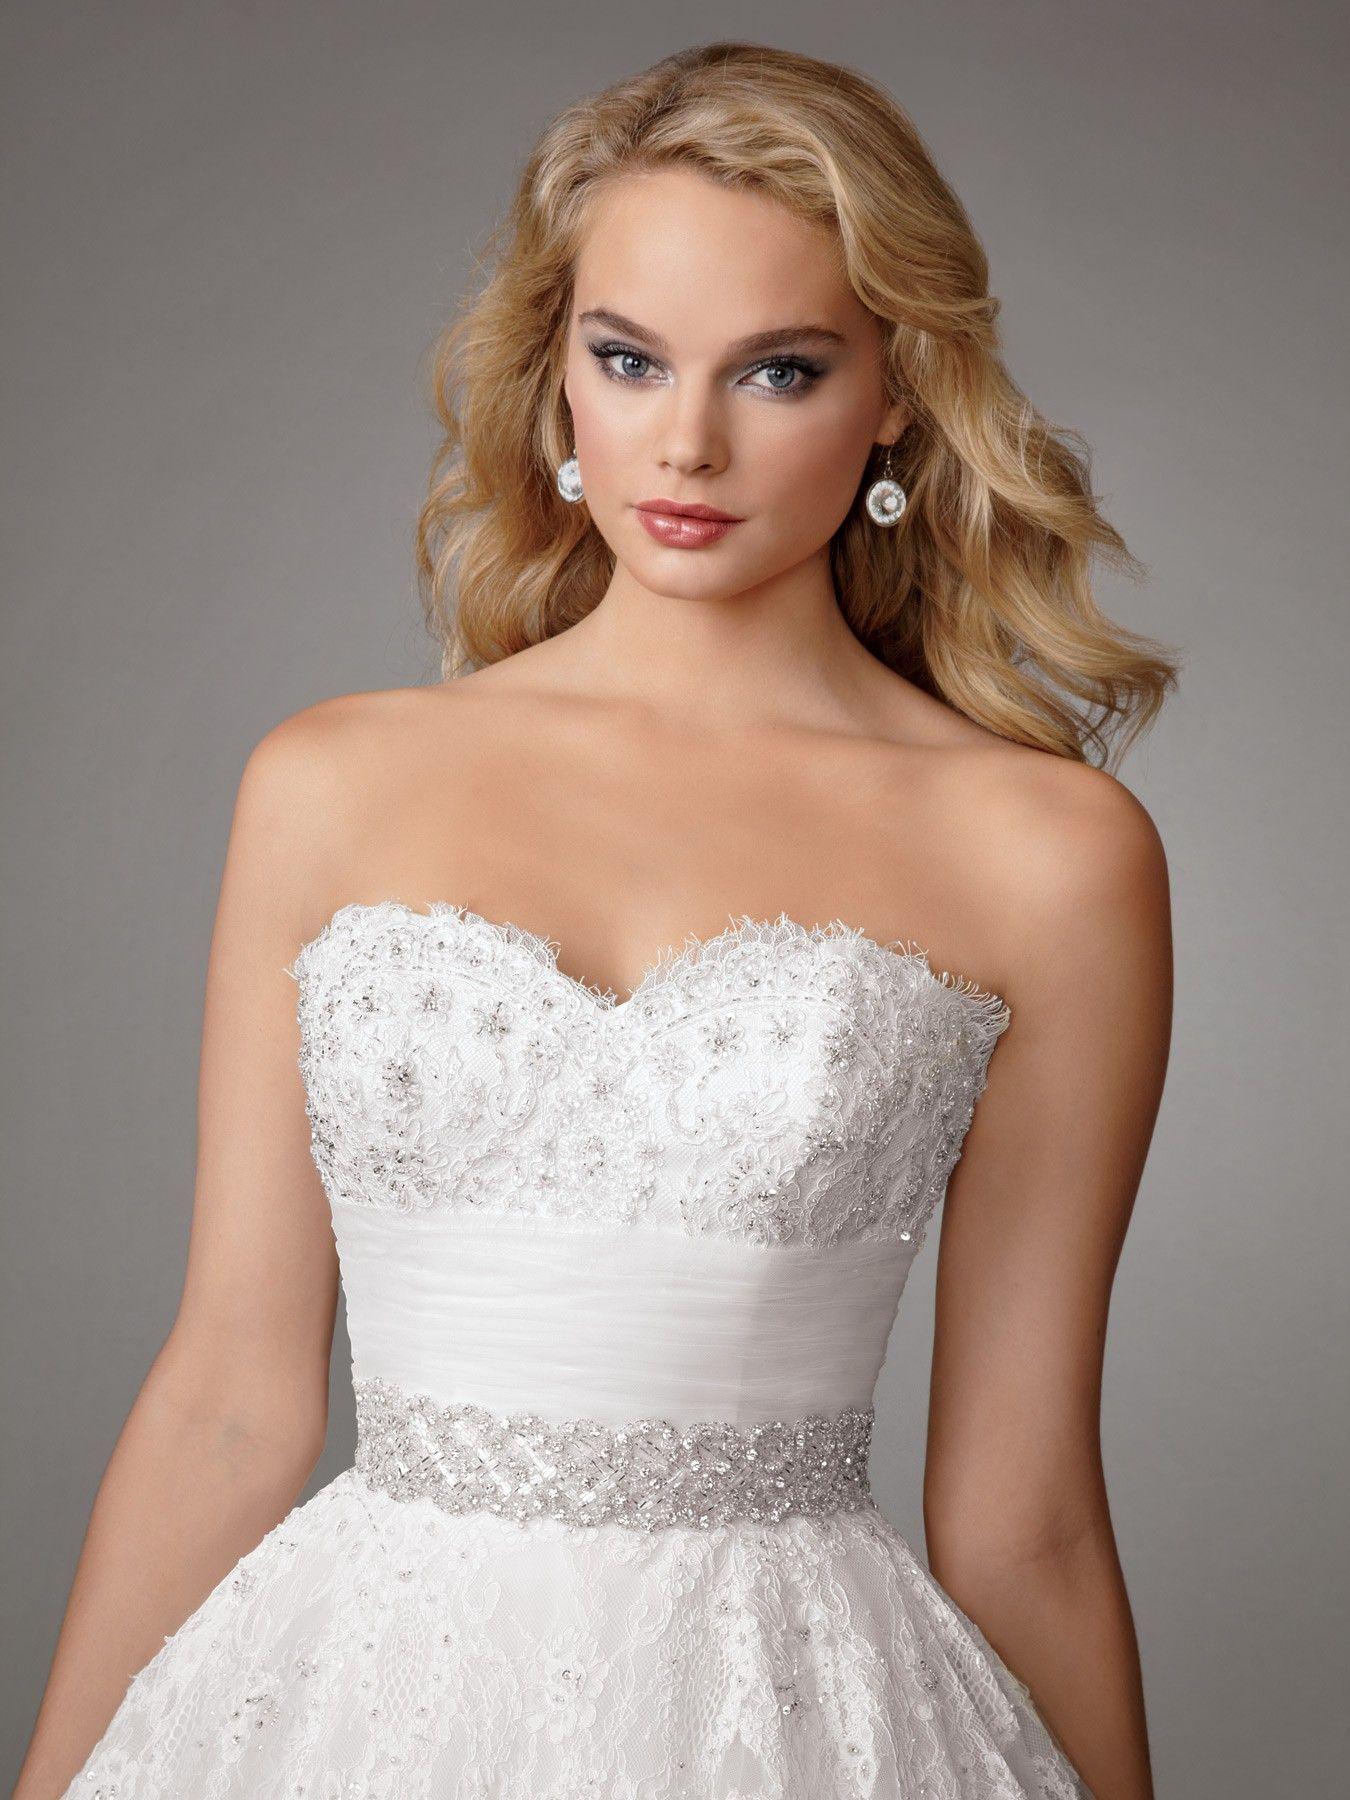 The most expensive wedding dress  Jordan Fashions M bodice  The most expensive dress you will ever